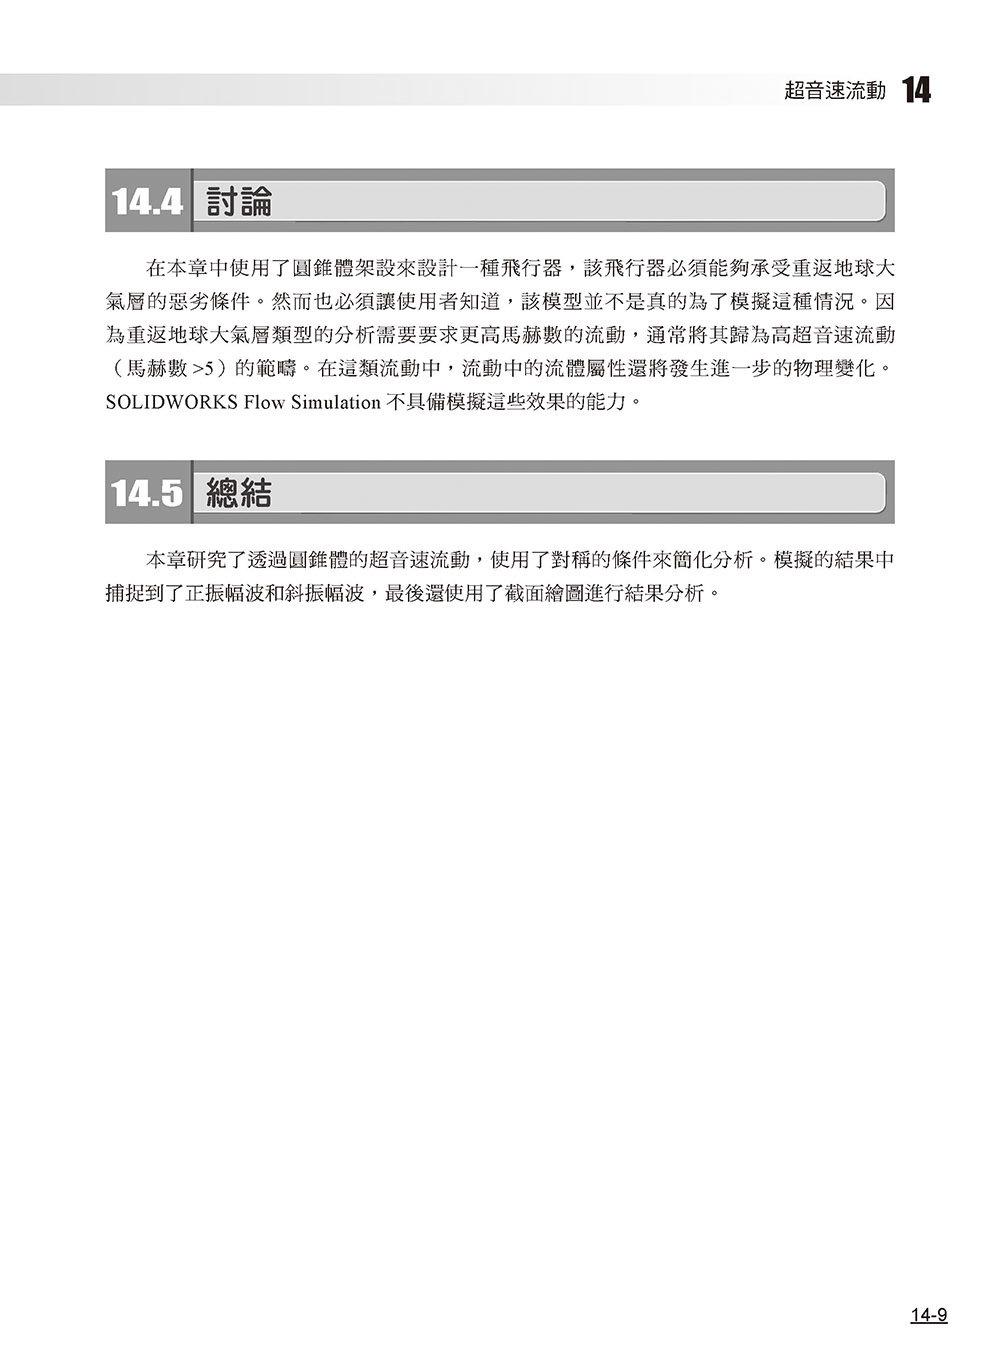 SOLIDWORKS Flow Simulation 培訓教材<繁體中文版>-preview-8